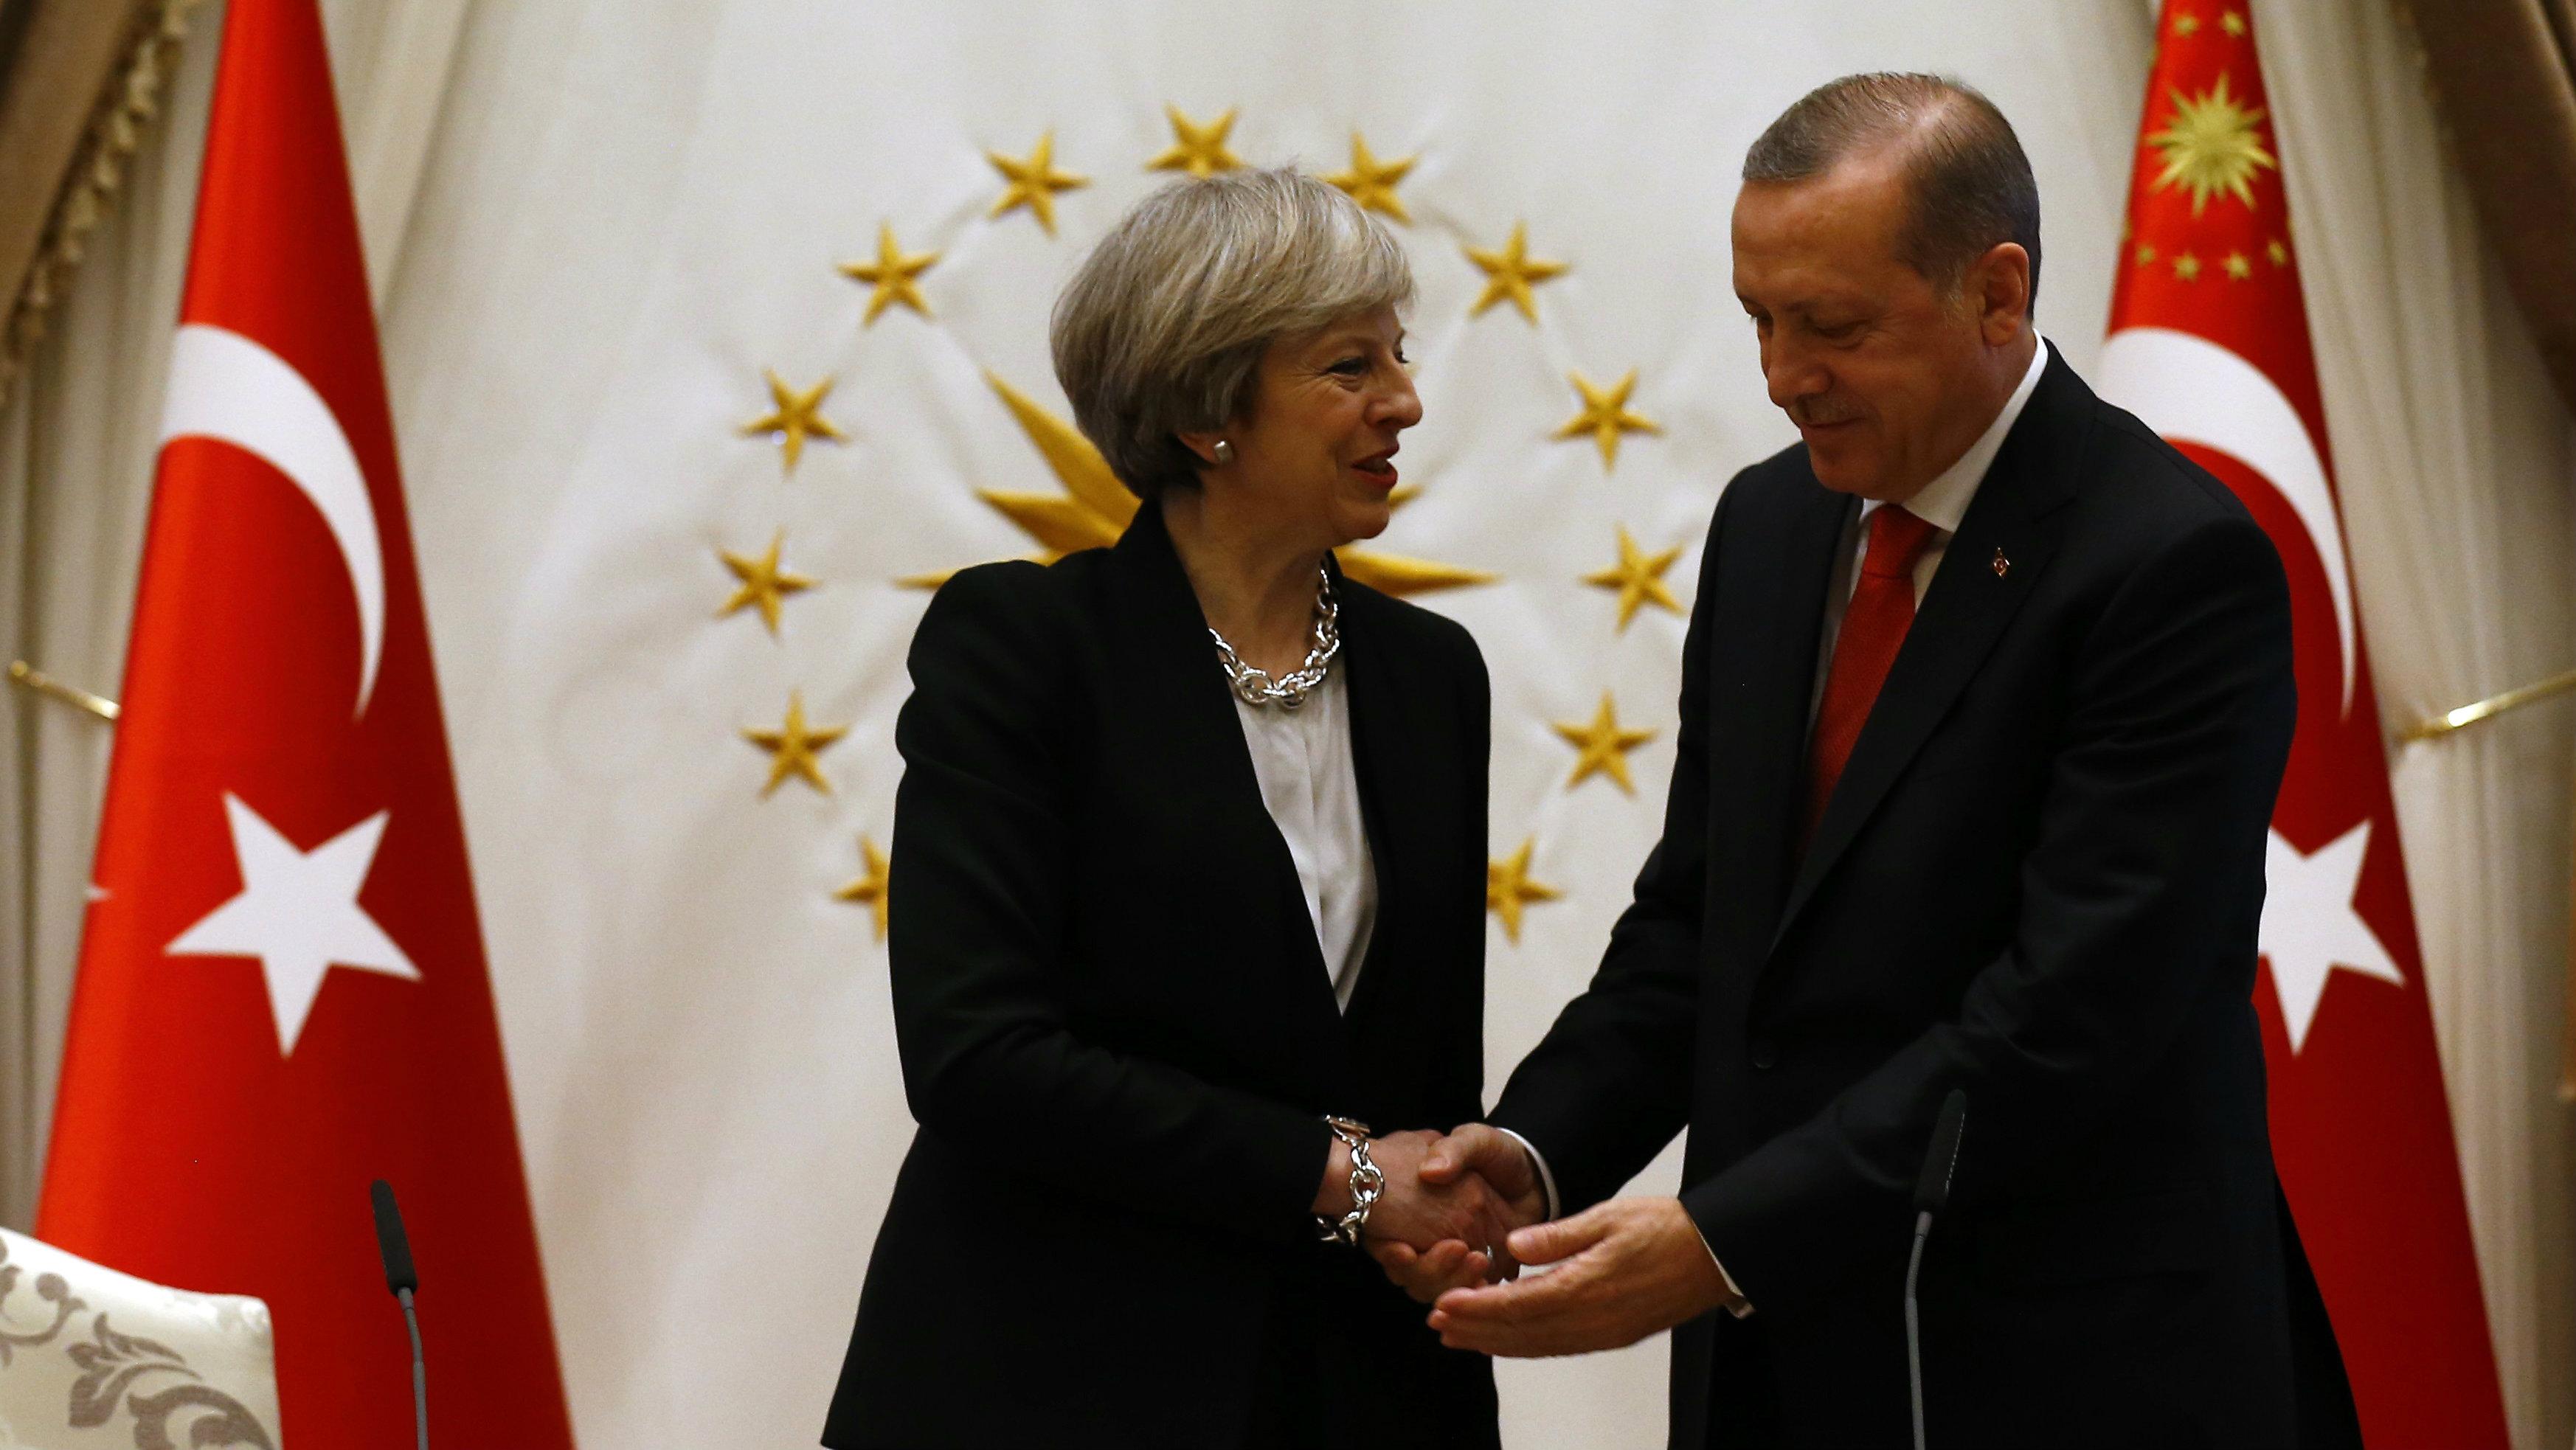 British Prime Minister Theresa May with Turkish President Recep Tayyip Erdogan